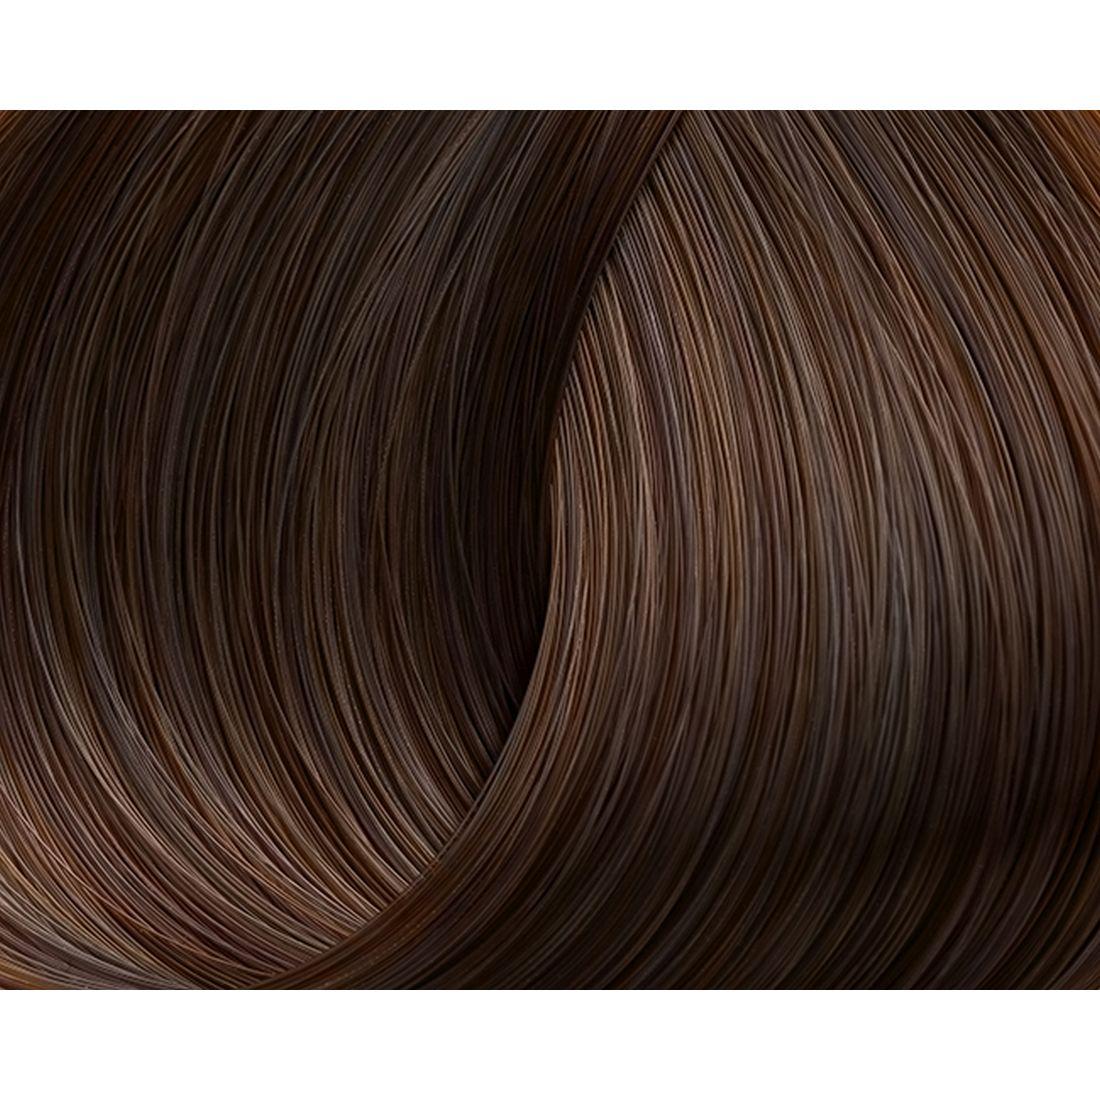 Lorvenn Beauty Color Επαγγελματική Βαφή Σωληνάριο 70ml No 7.75 Παλίσανδρος Ανοιχτός No 7.75 Παλίσανδρος Ανοιχτός